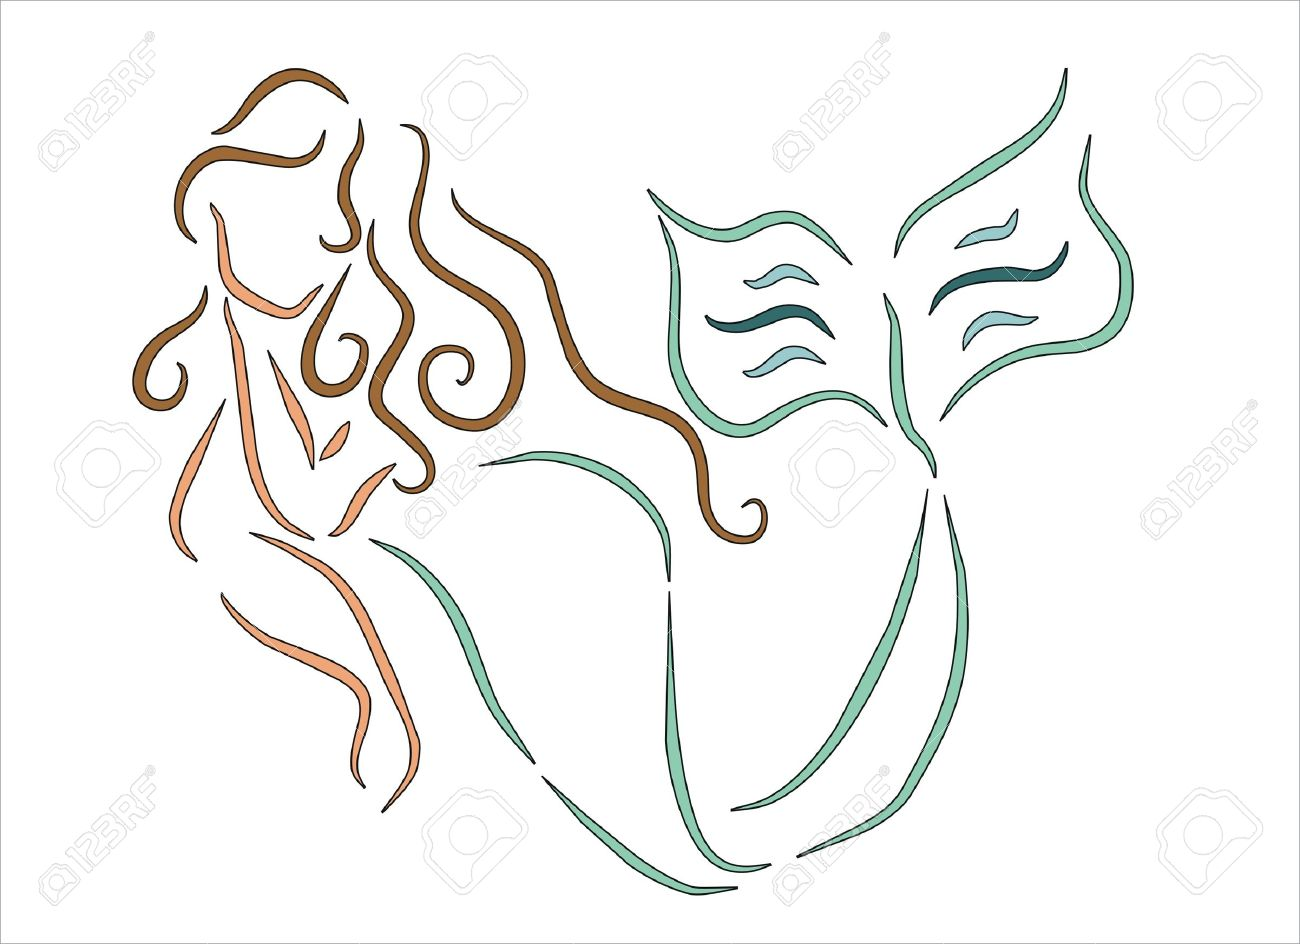 Mermaid Swimming Drawings Vector Mermaid Swimming in